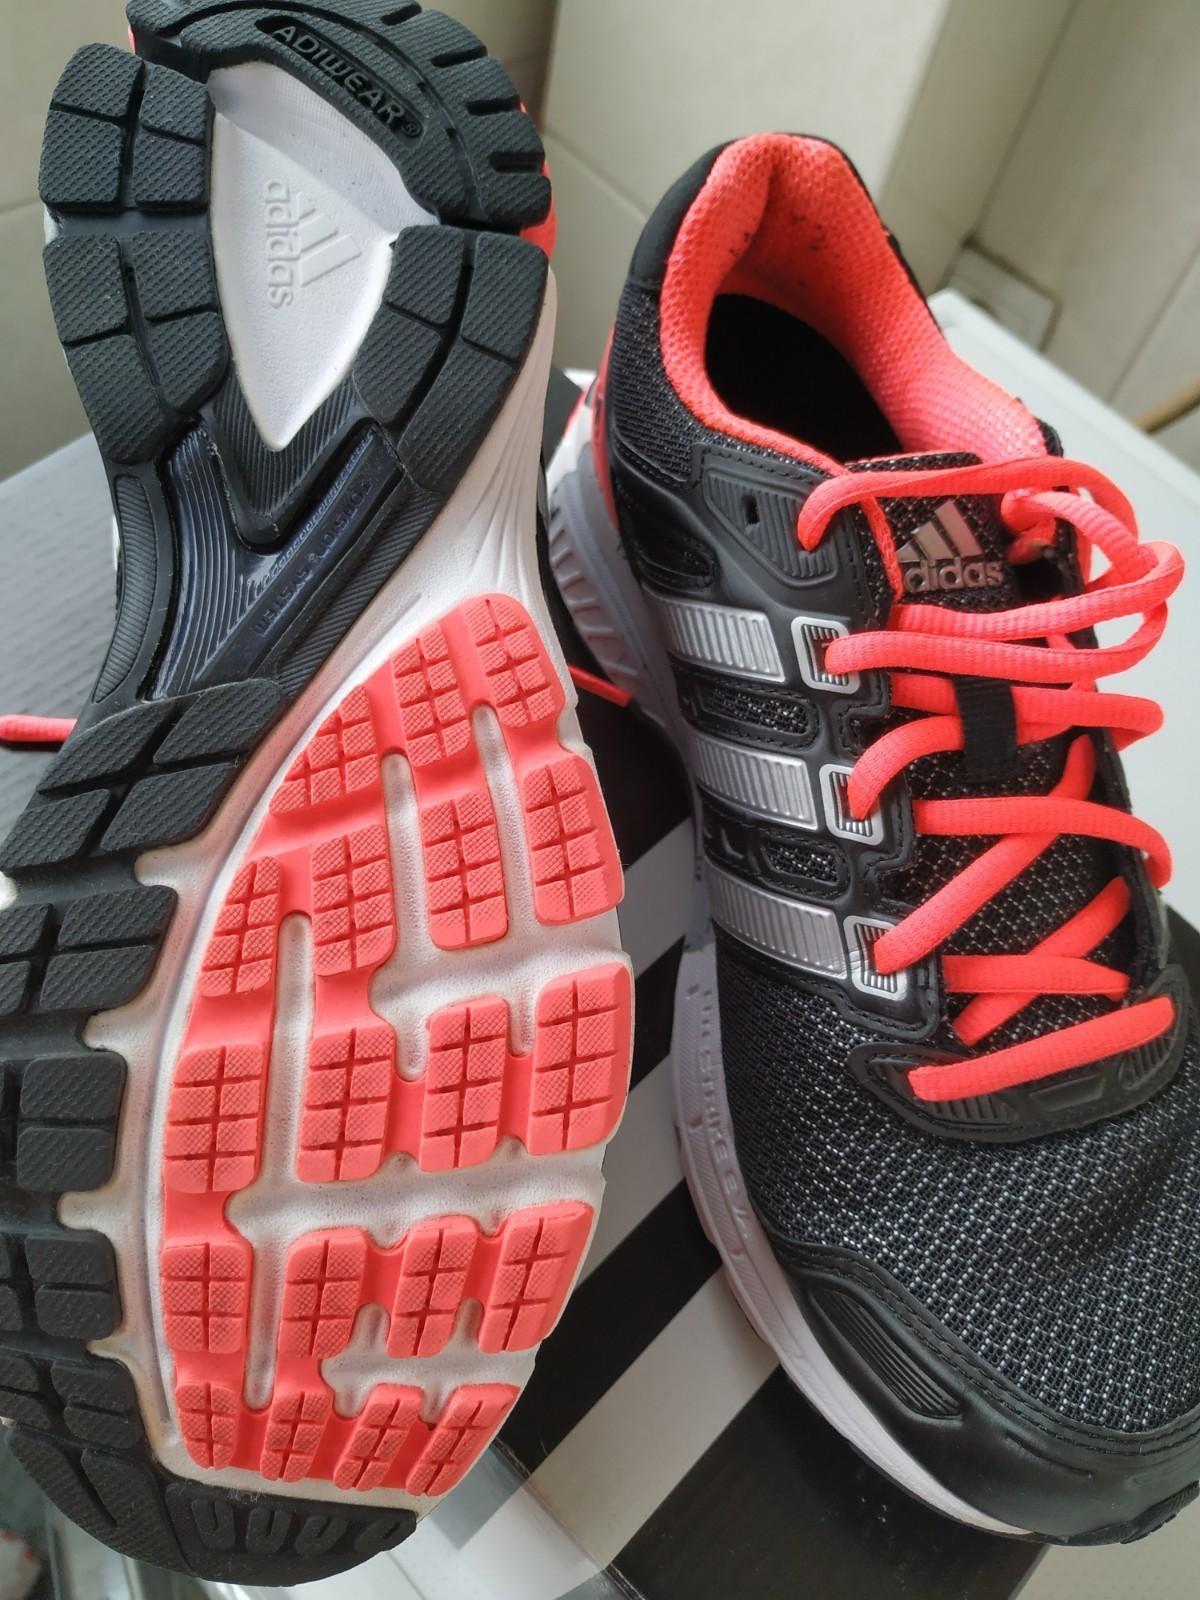 Sapatilhas Adidas 1